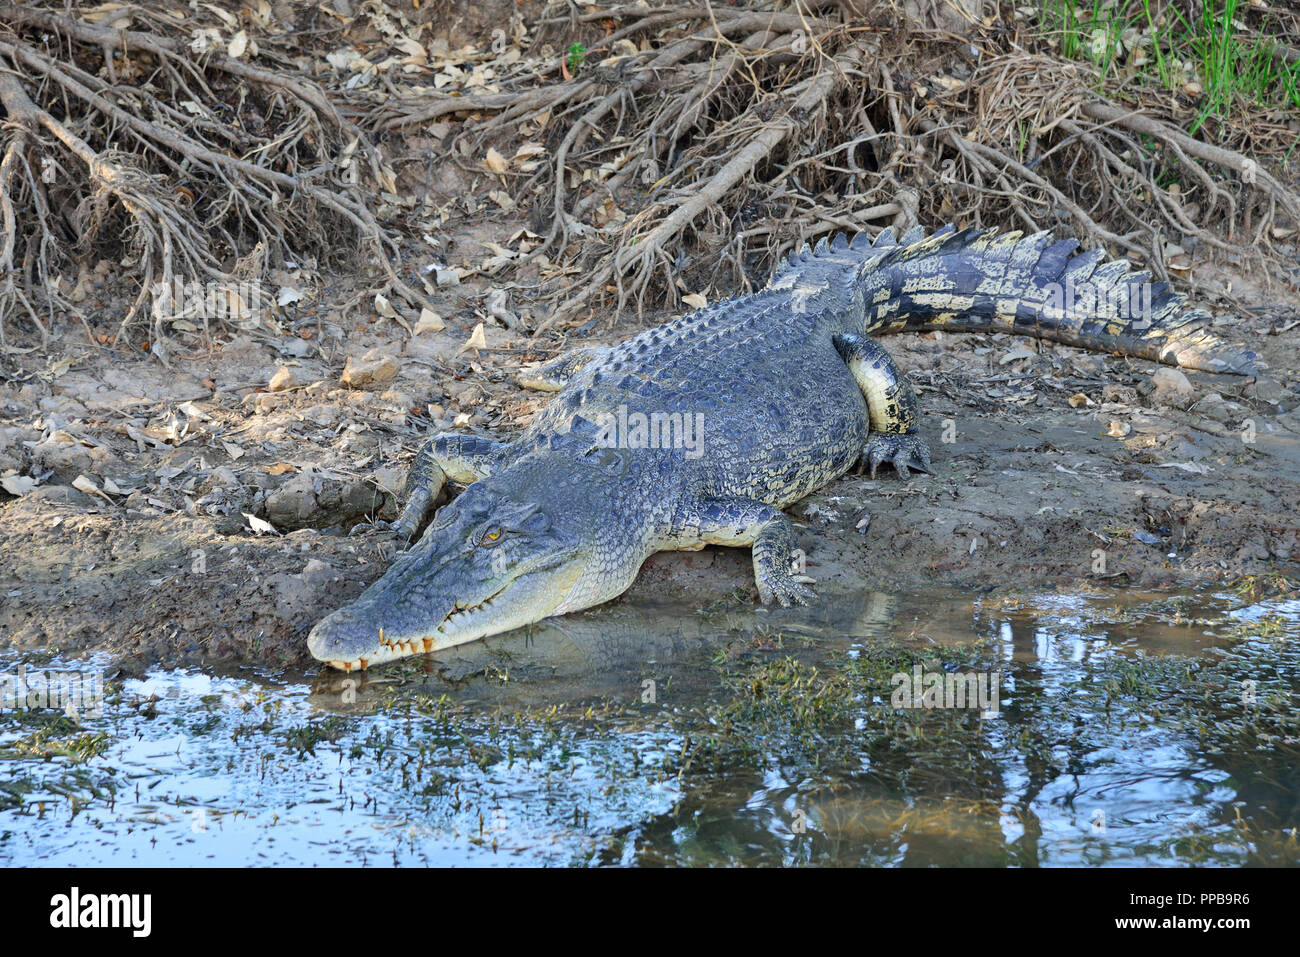 Large salt water crocodile resting on the banks of the Yellow Water Billabong,Kakadu, Northern Territory, Top End, Australia Stock Photo